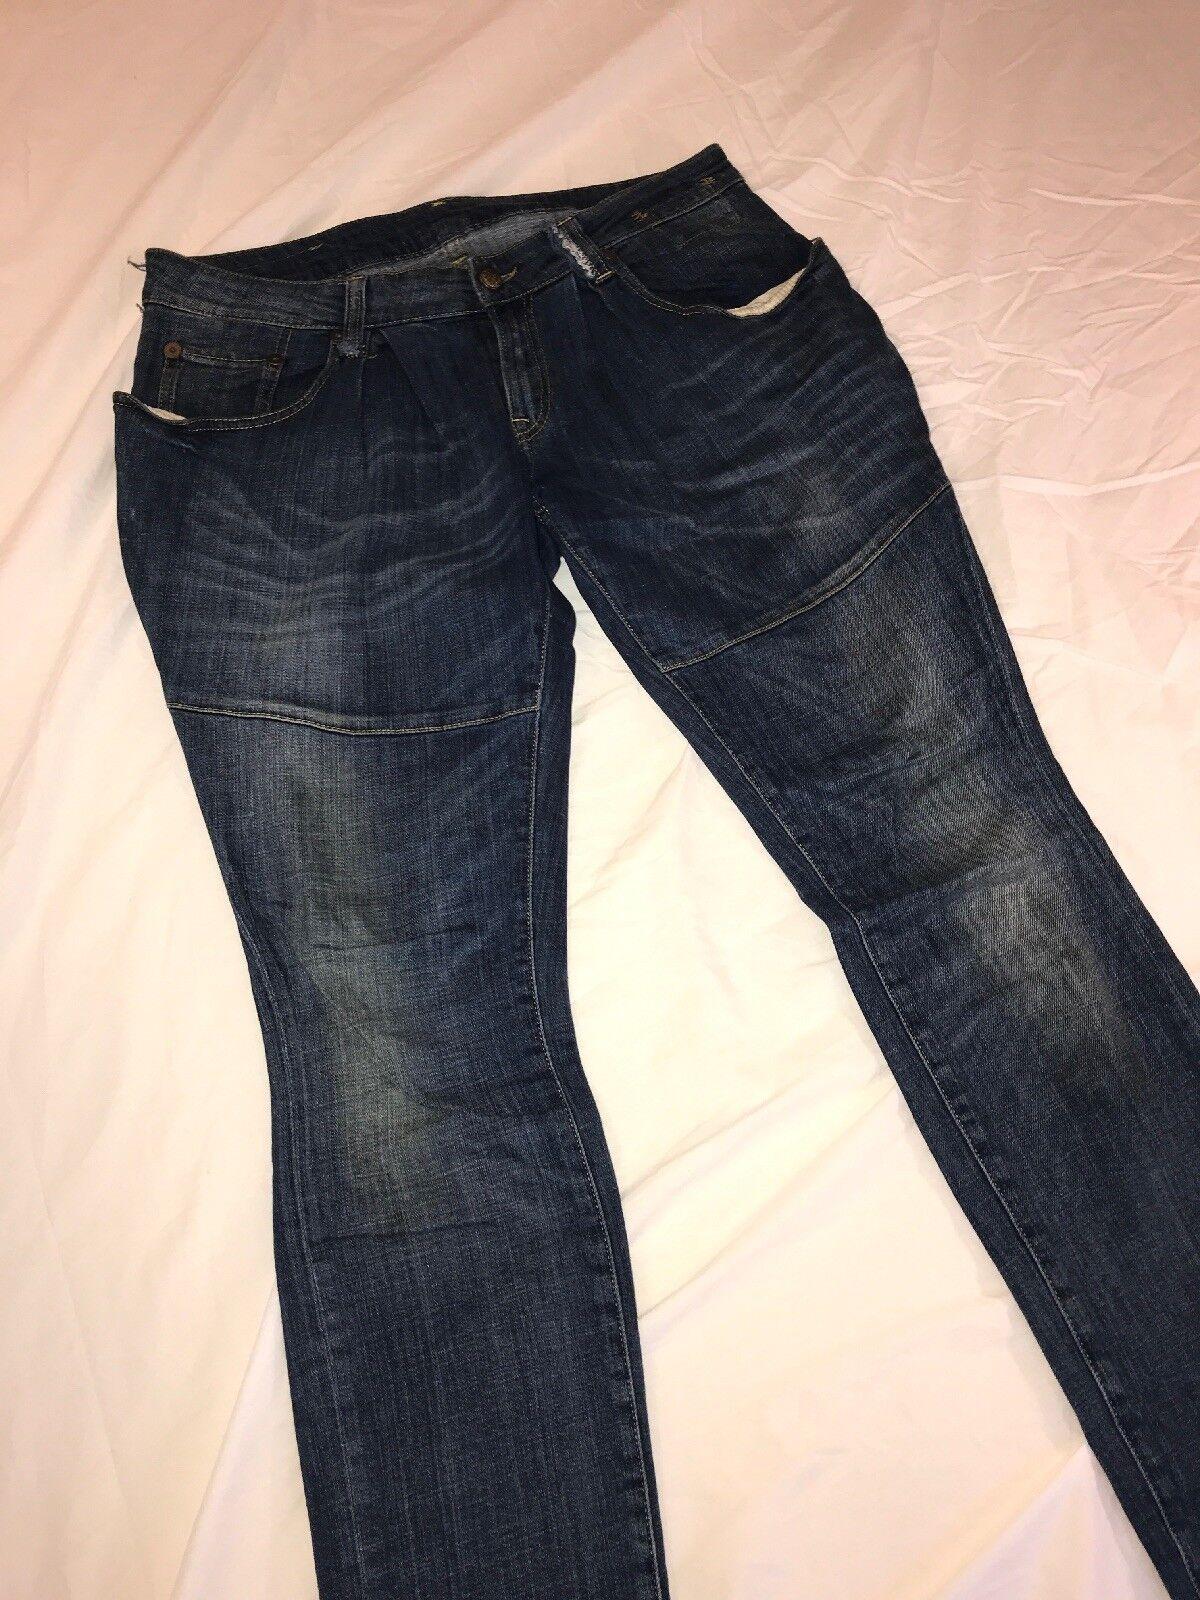 R13 Denim Rouched Distressed Jeans Sz 29